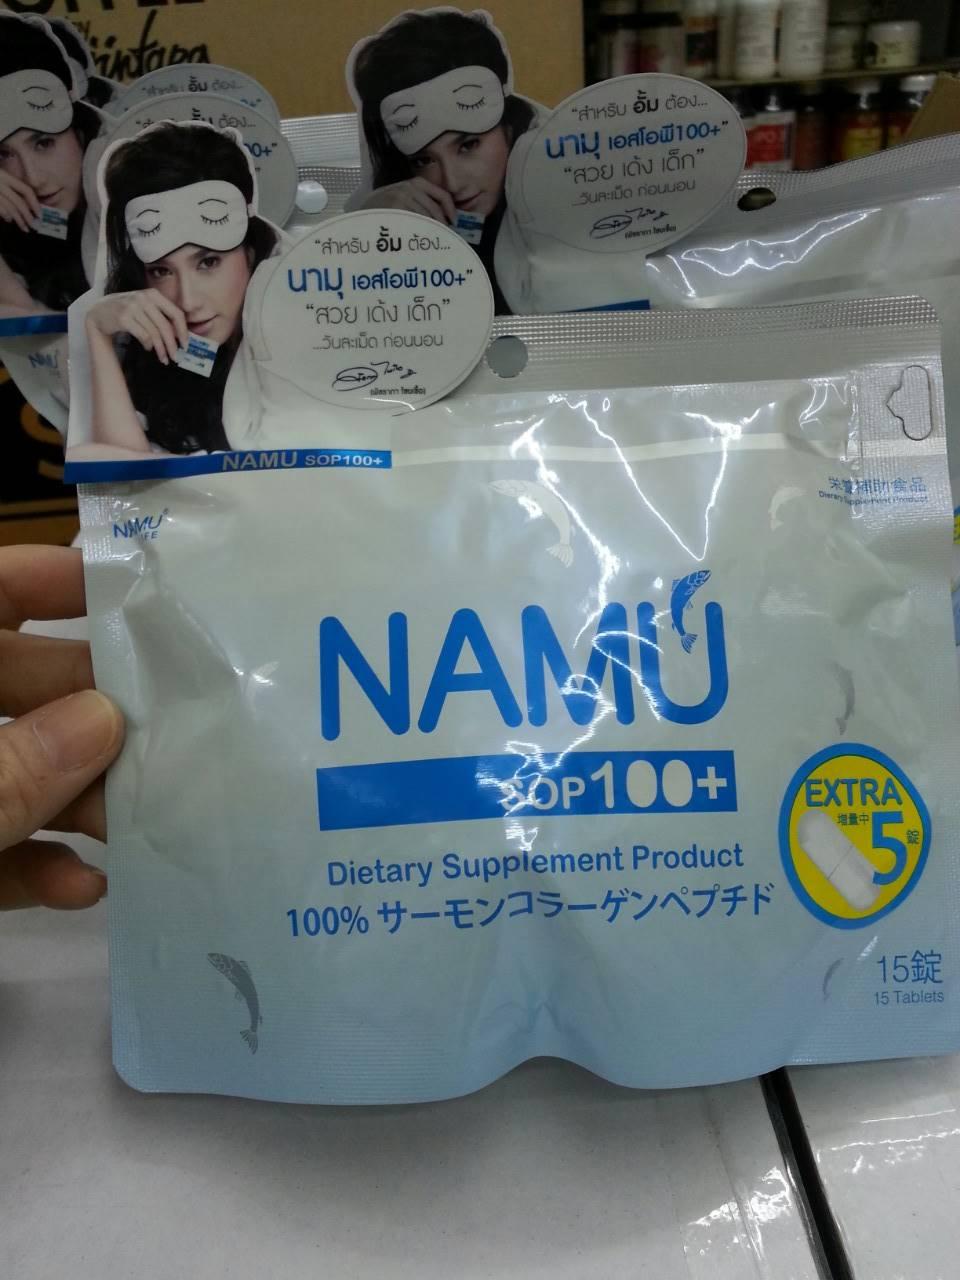 Namu SOP 100+ นามุ เอสโอพี 100+ ขนาด 15 เม็ด แถมพิเศษอีก 5 เม็ด